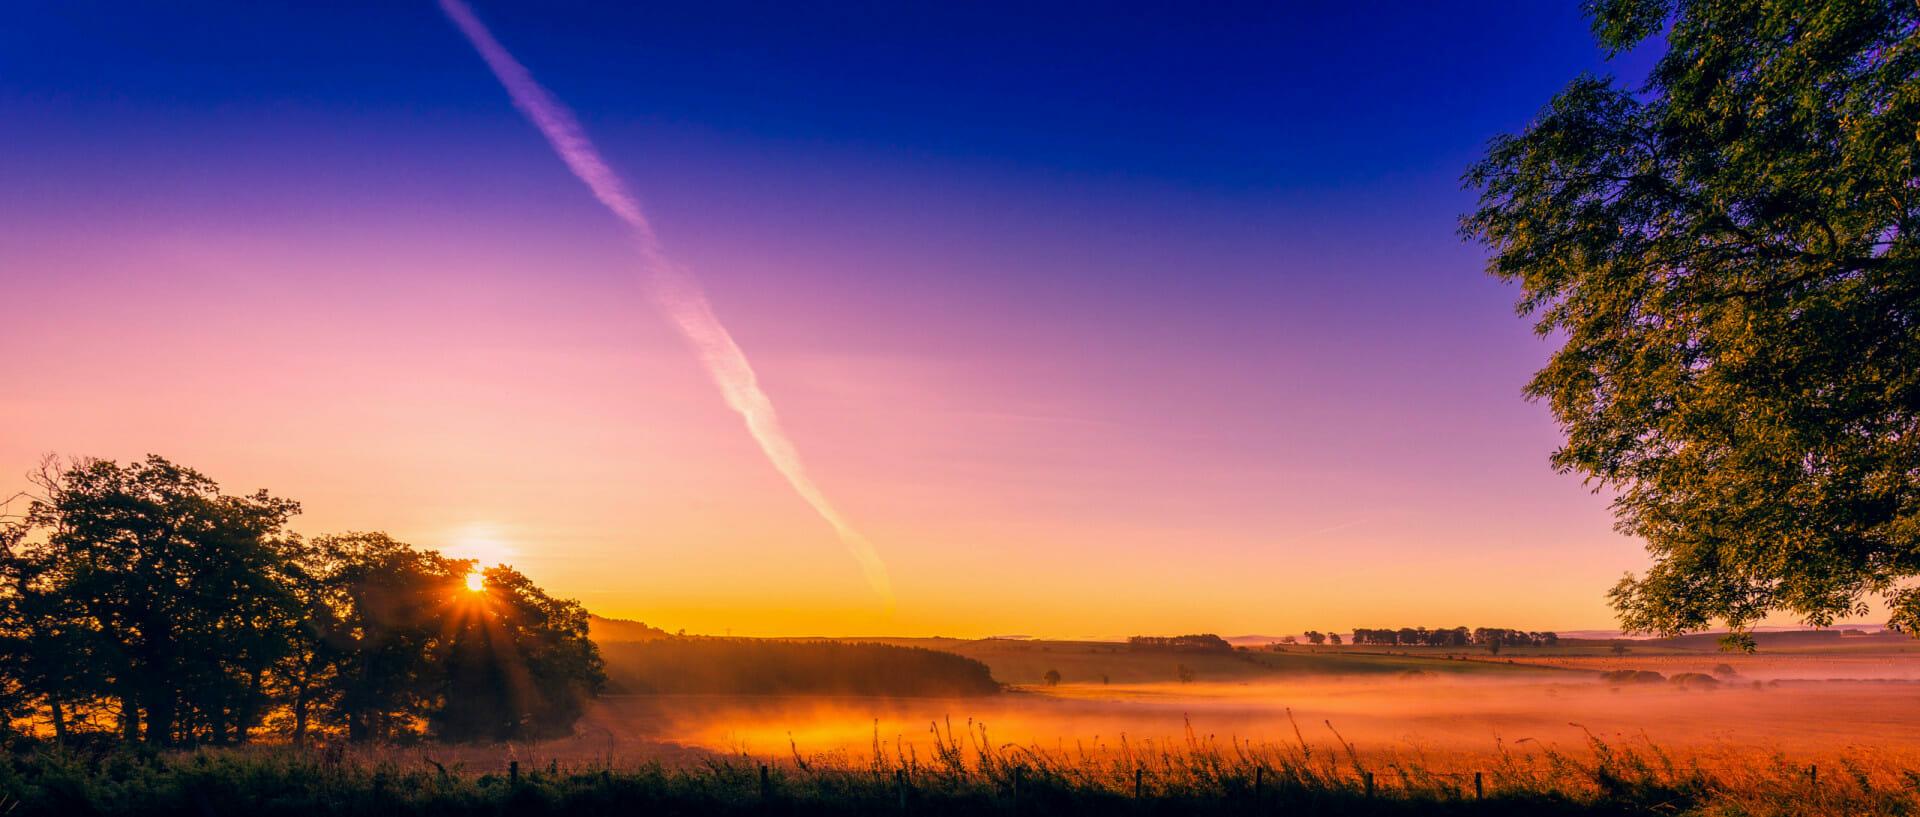 Early morning sun shining on mist over landscape